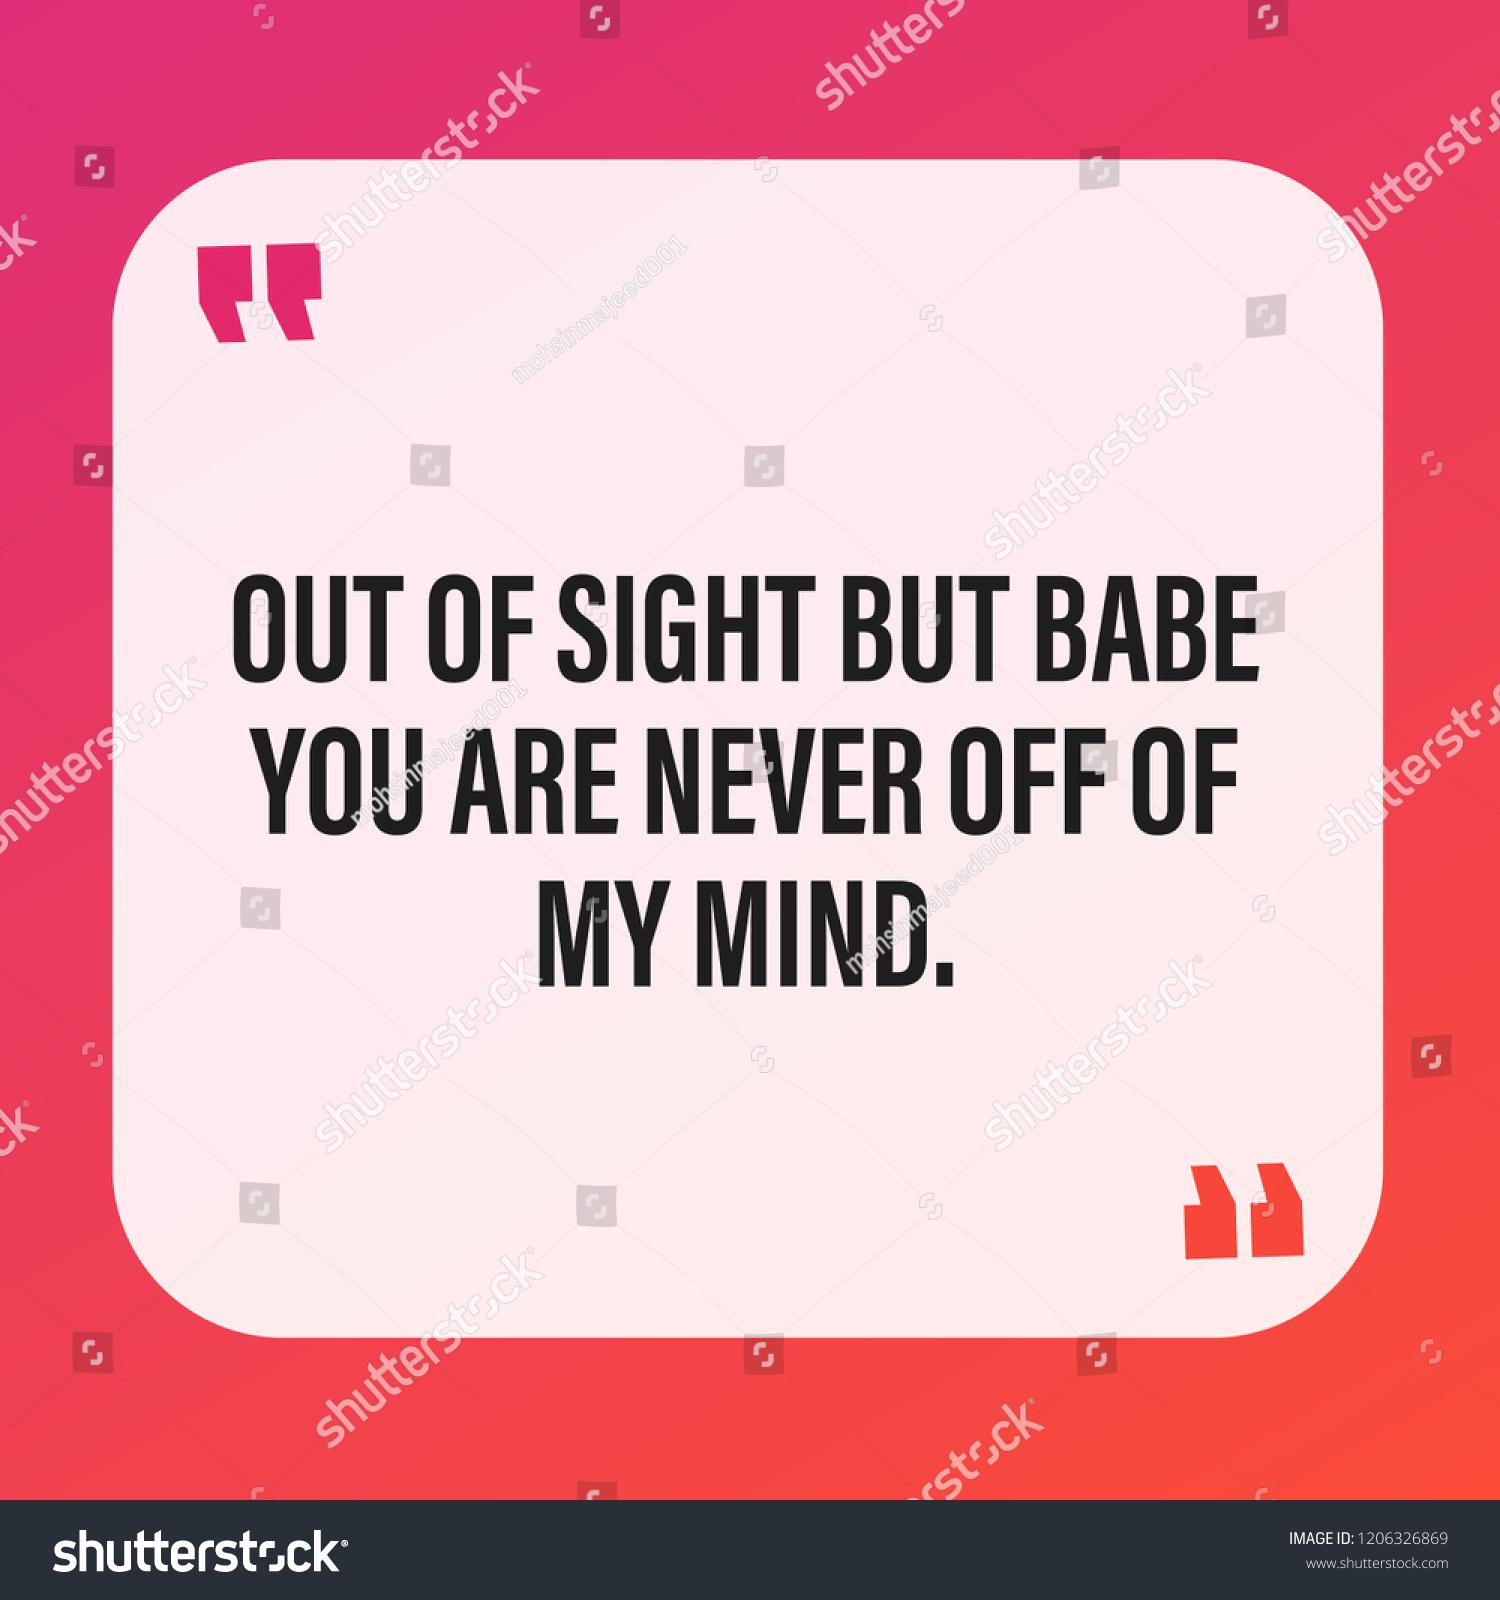 Cute Missing You Quotes Express Your Stockvector Rechtenvrij